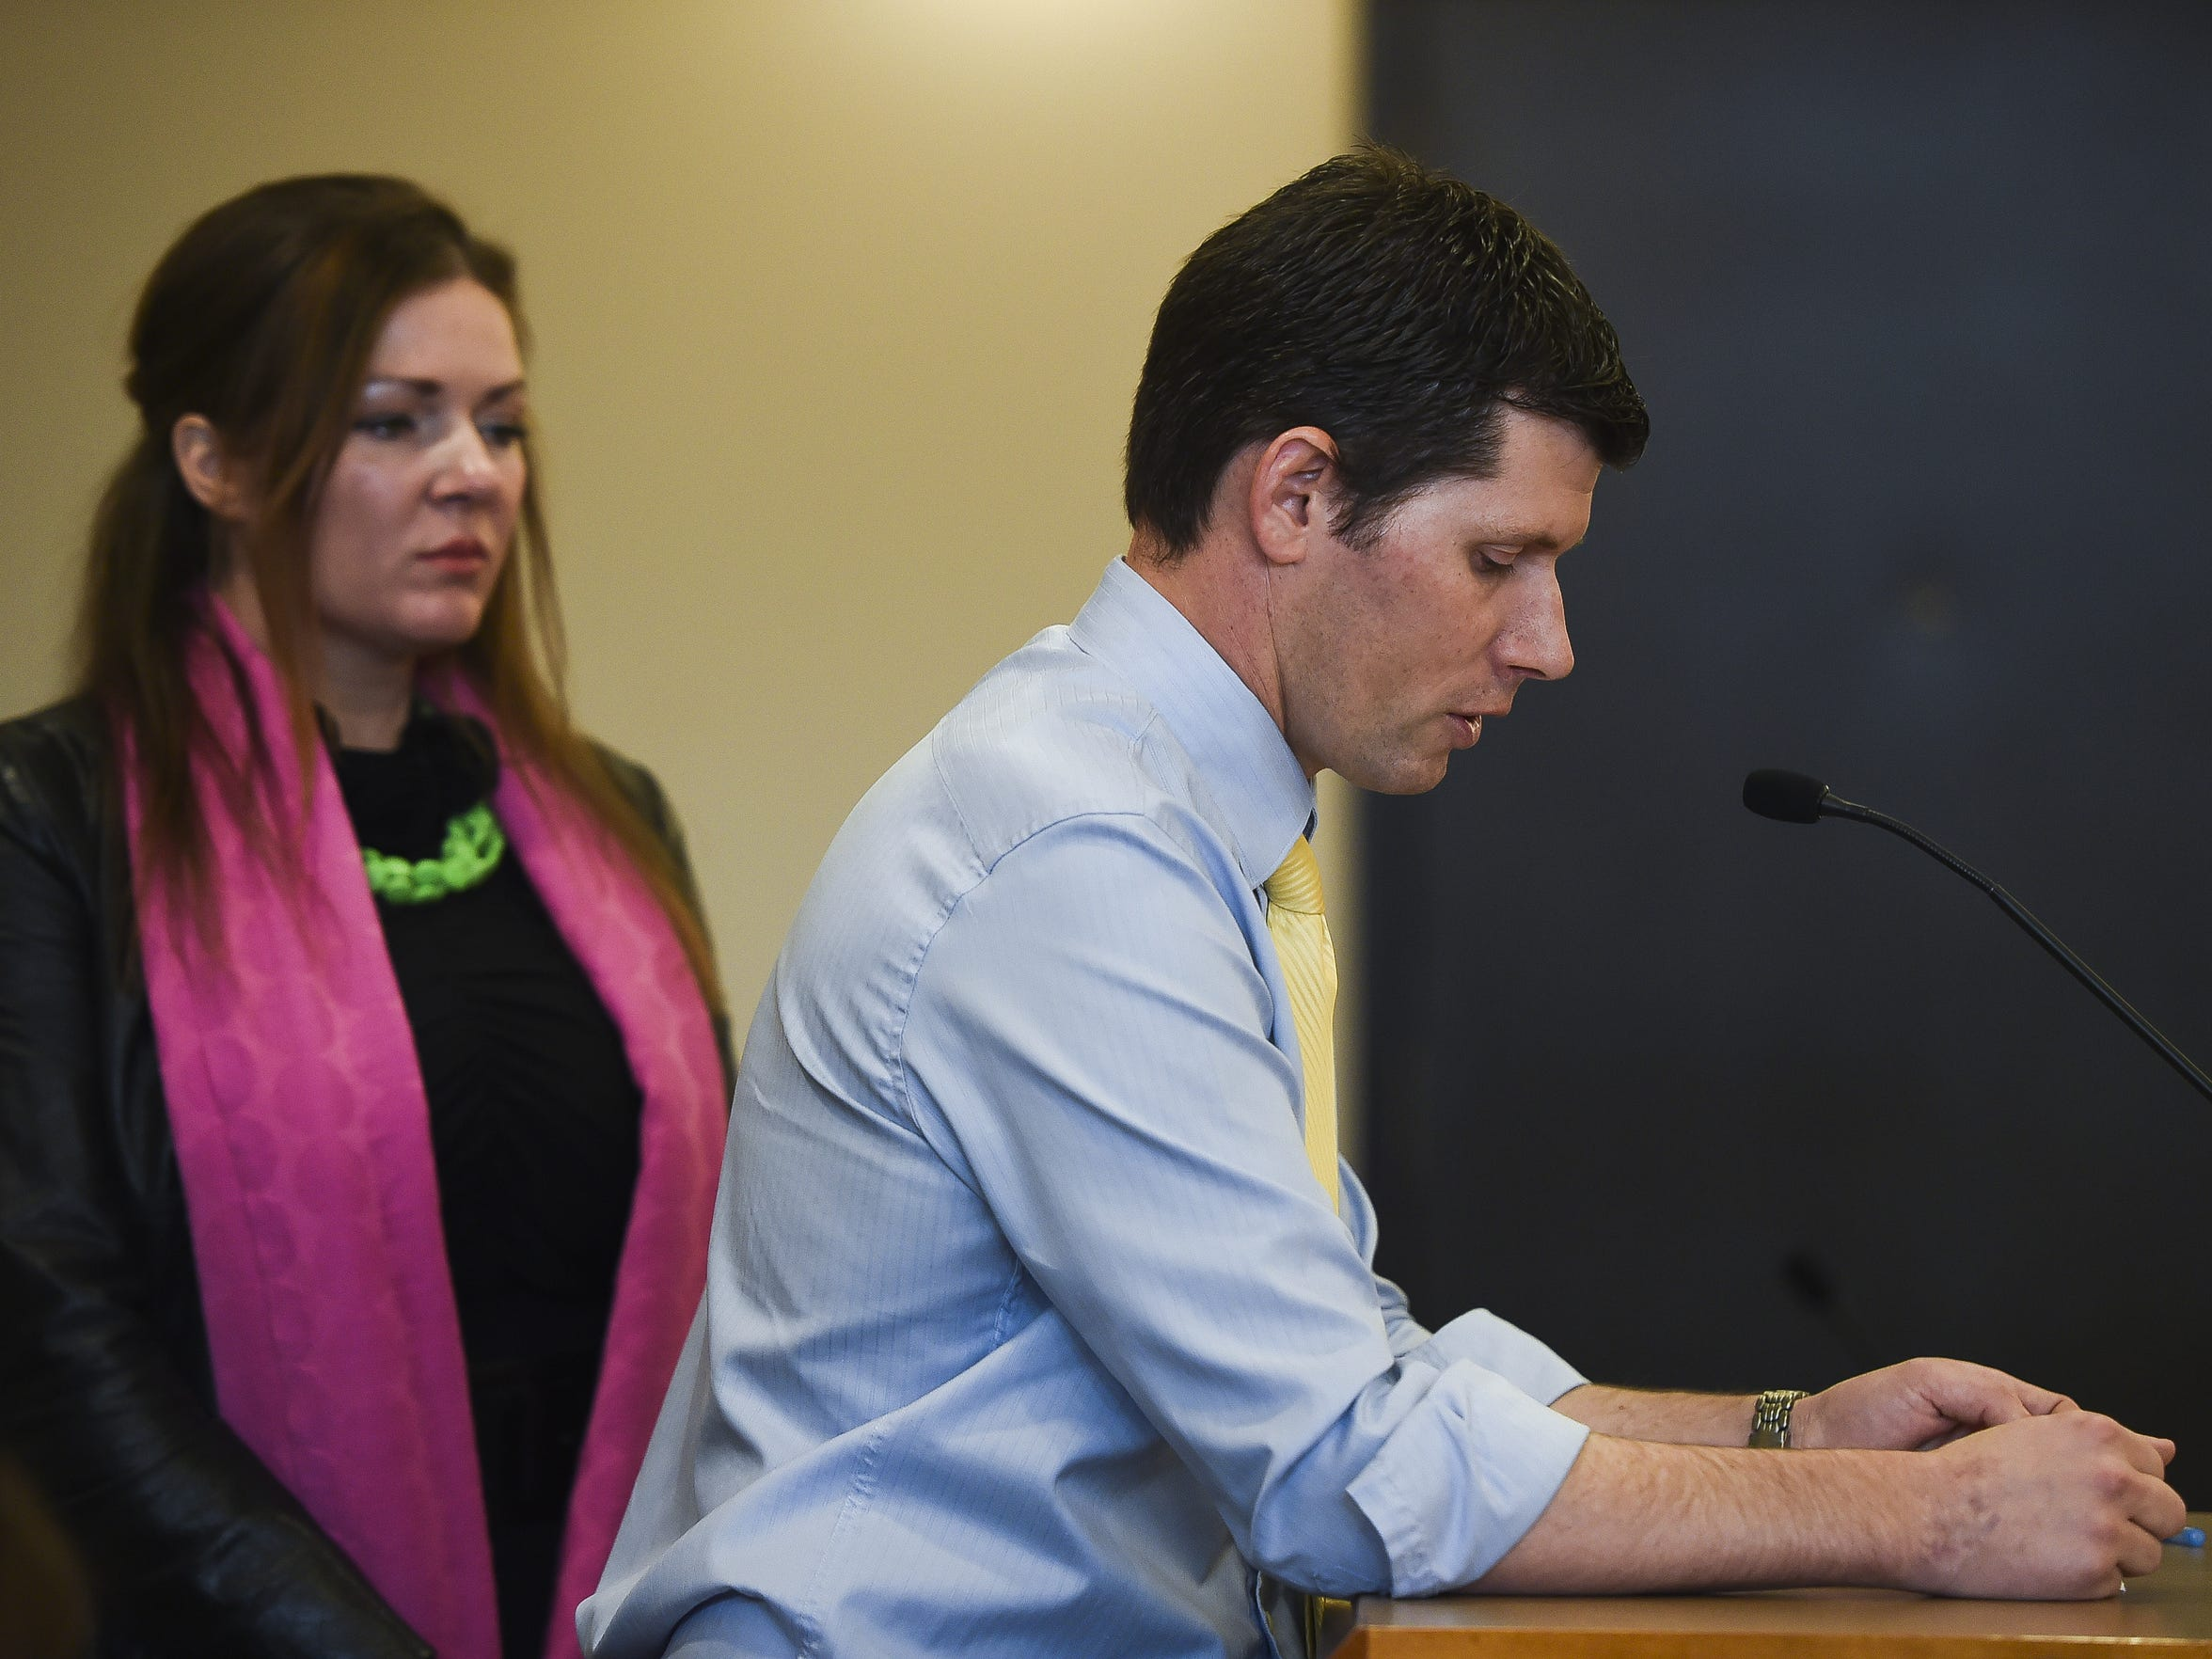 Kerry Wicks watches as her husband, Jeff Wicks, speaks